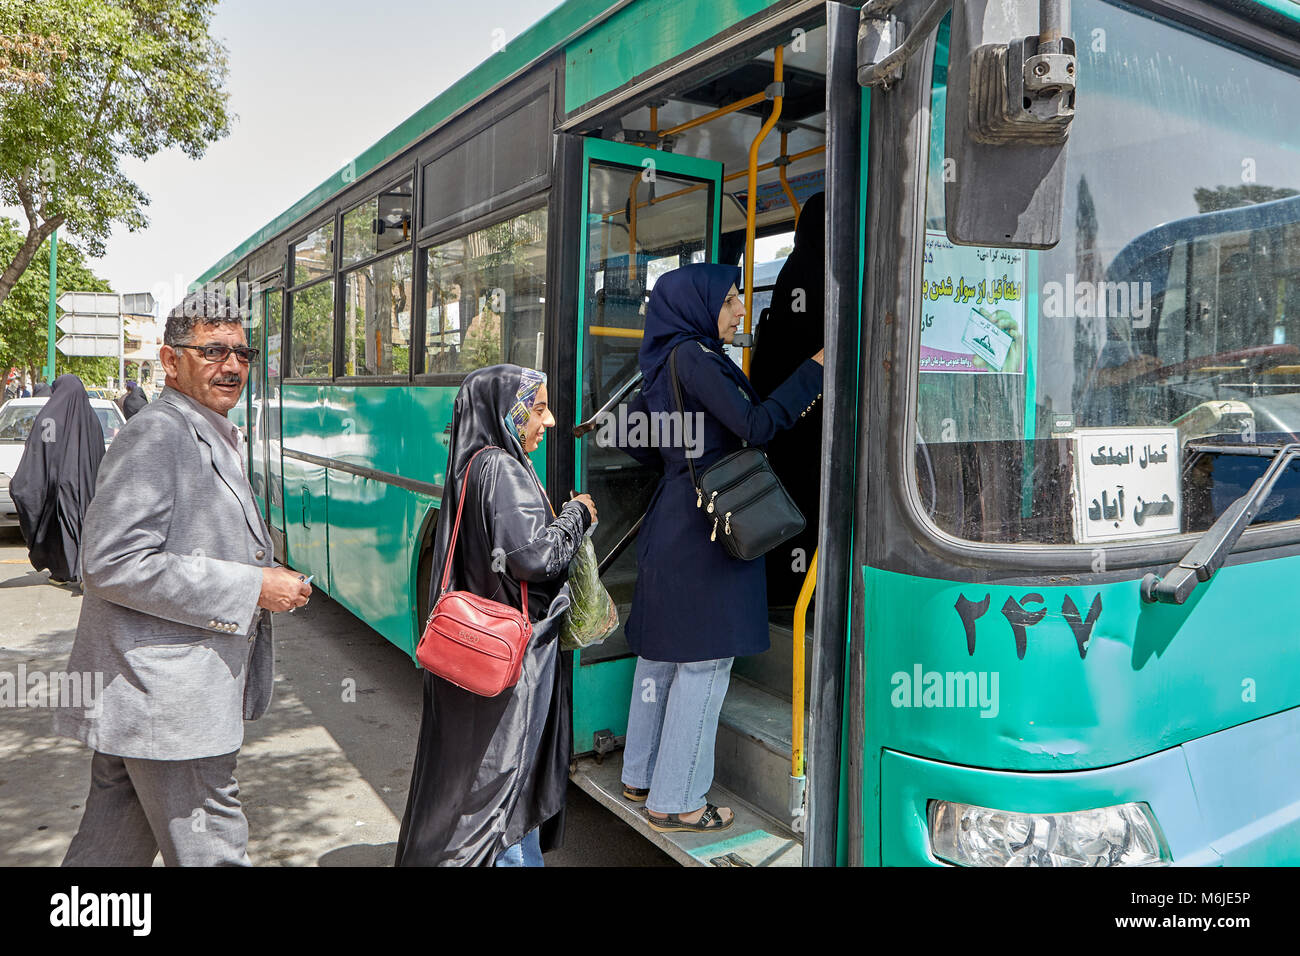 Kashan, Iran - April 27, 2017: Passengers enter the municipal bus at a public transport stop. Stock Photo